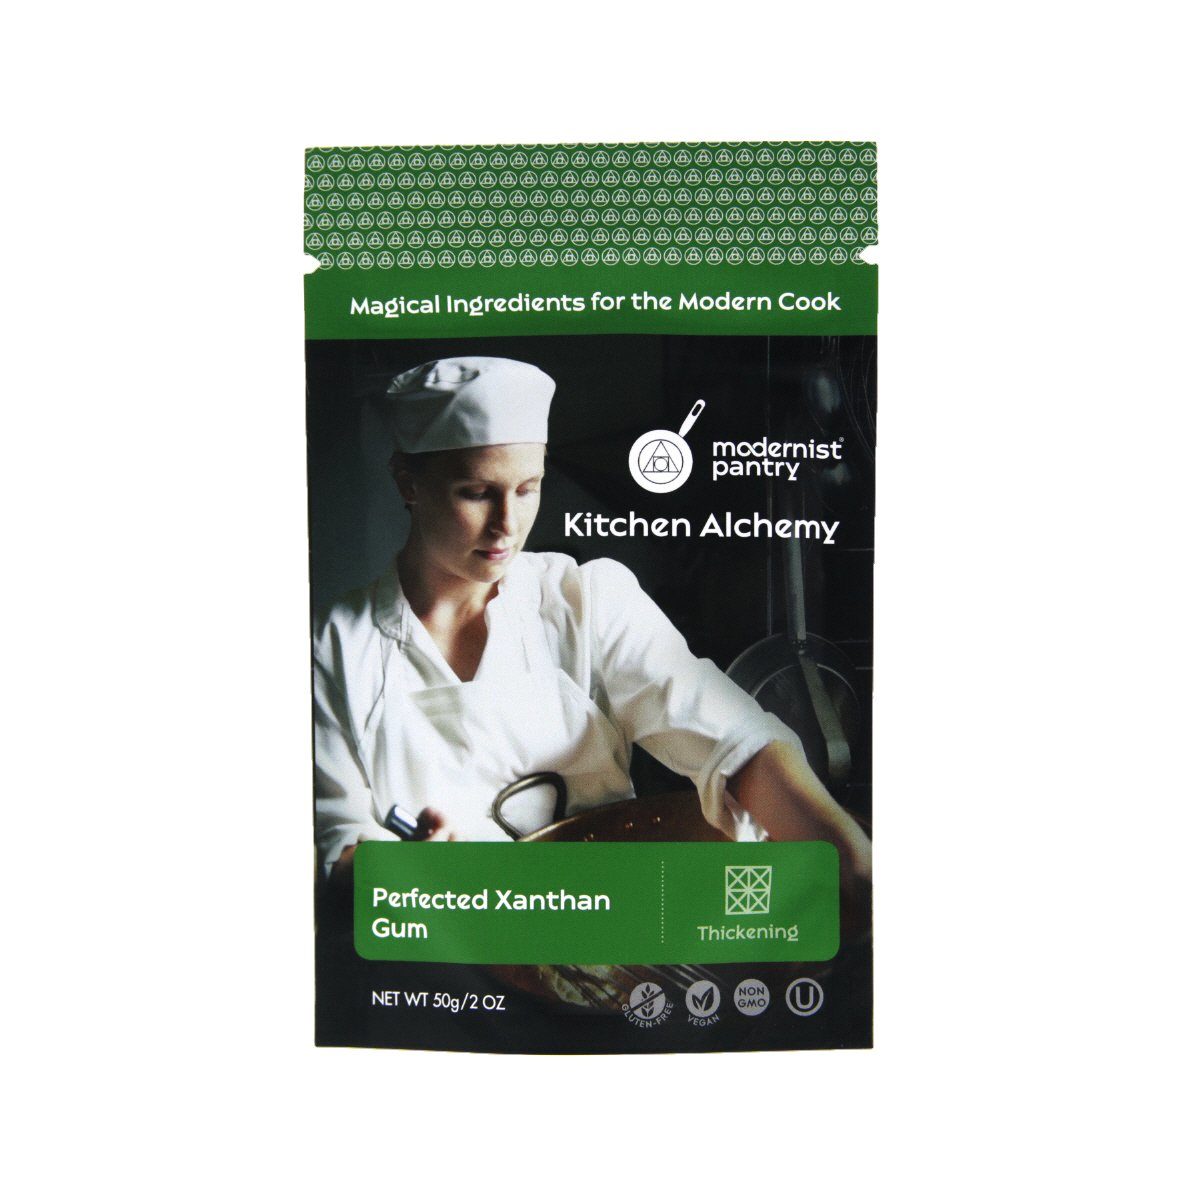 Perfected Xanthan Gum ⊘ Non-GMO ❤ Gluten-Free ☮ Vegan ✡ OU Kosher Certified - 50g/2oz